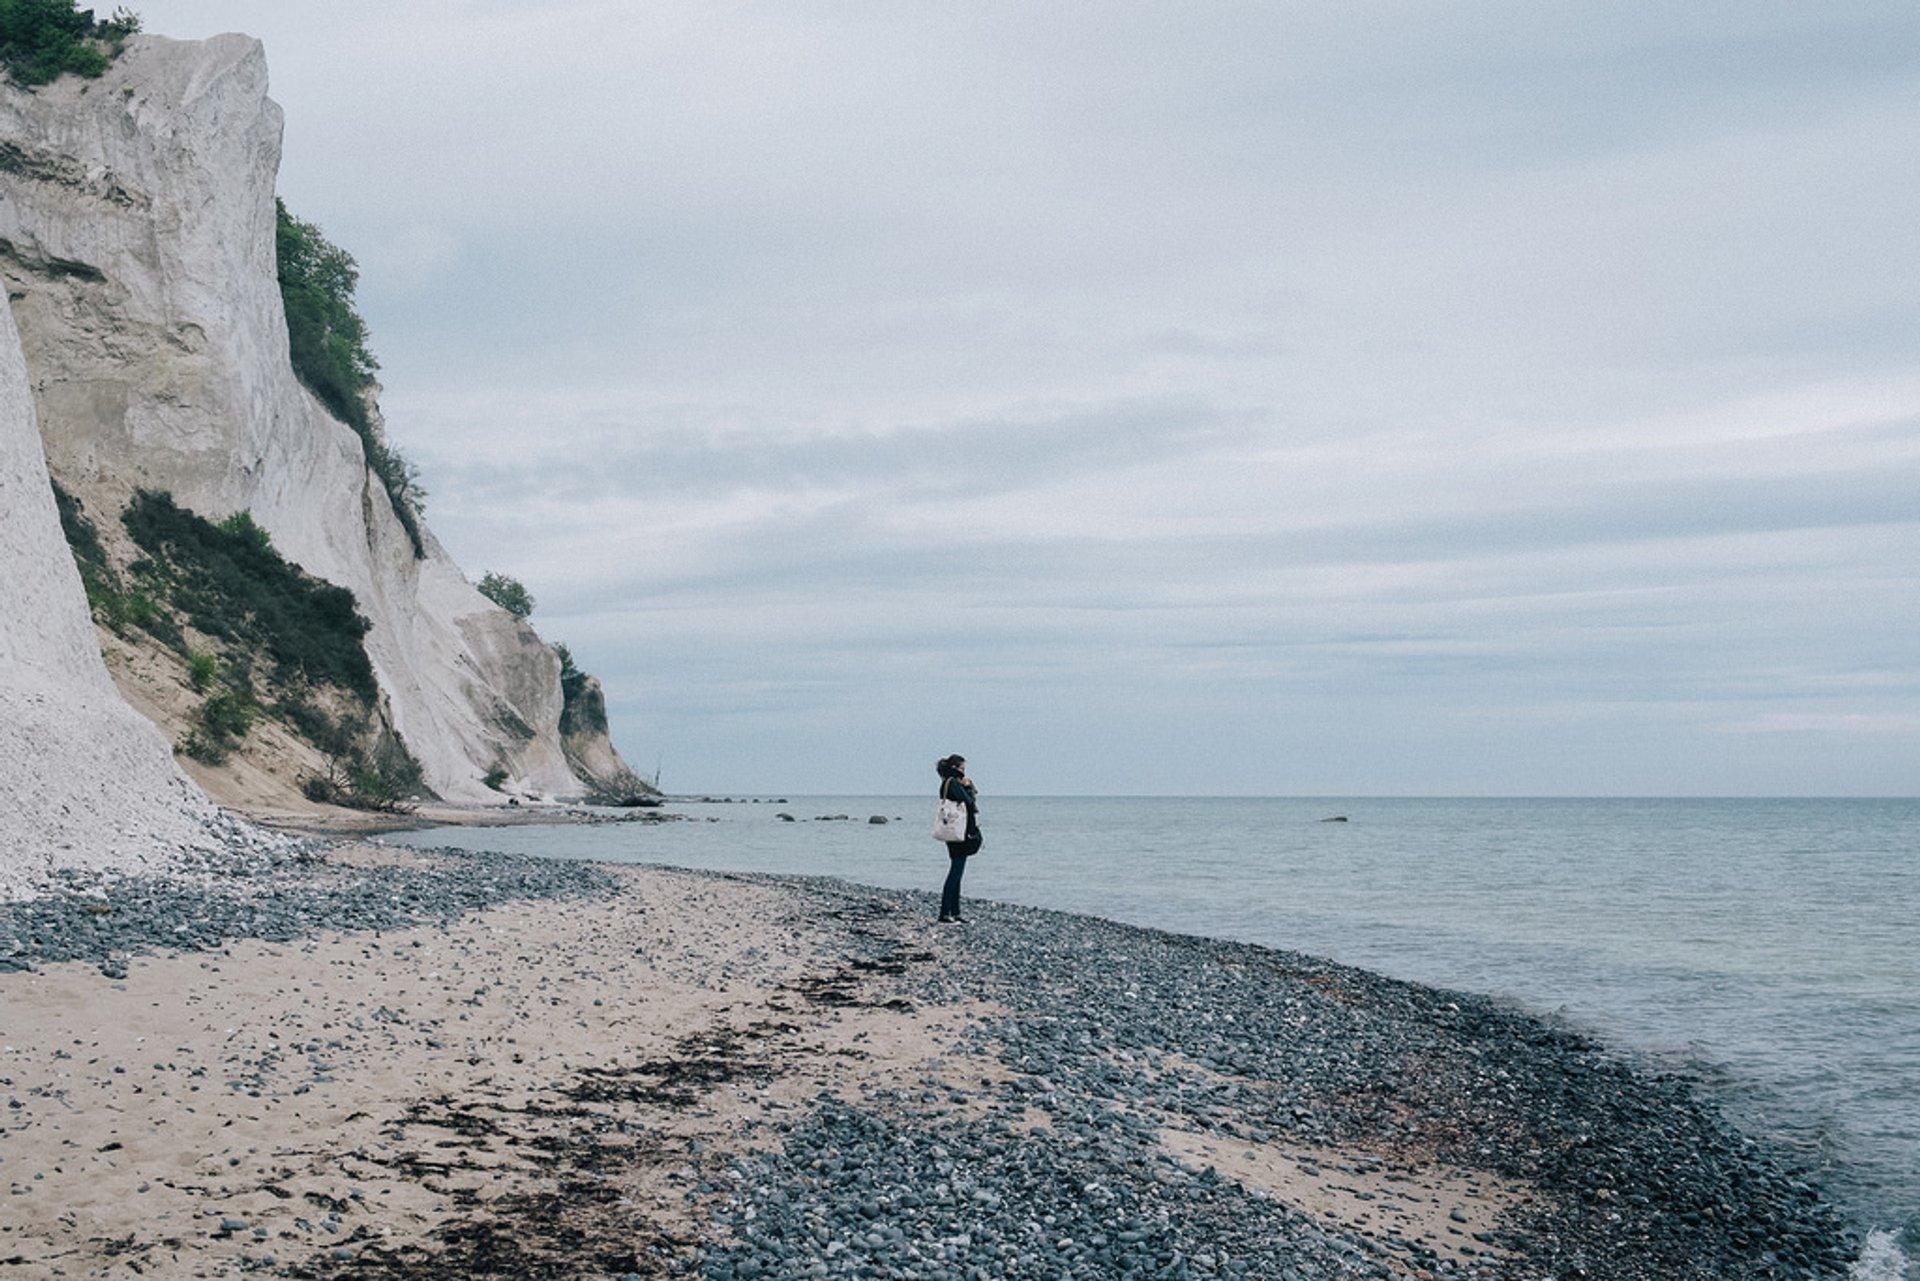 White Cliffs of Møns Klint in Denmark - Best Season 2020